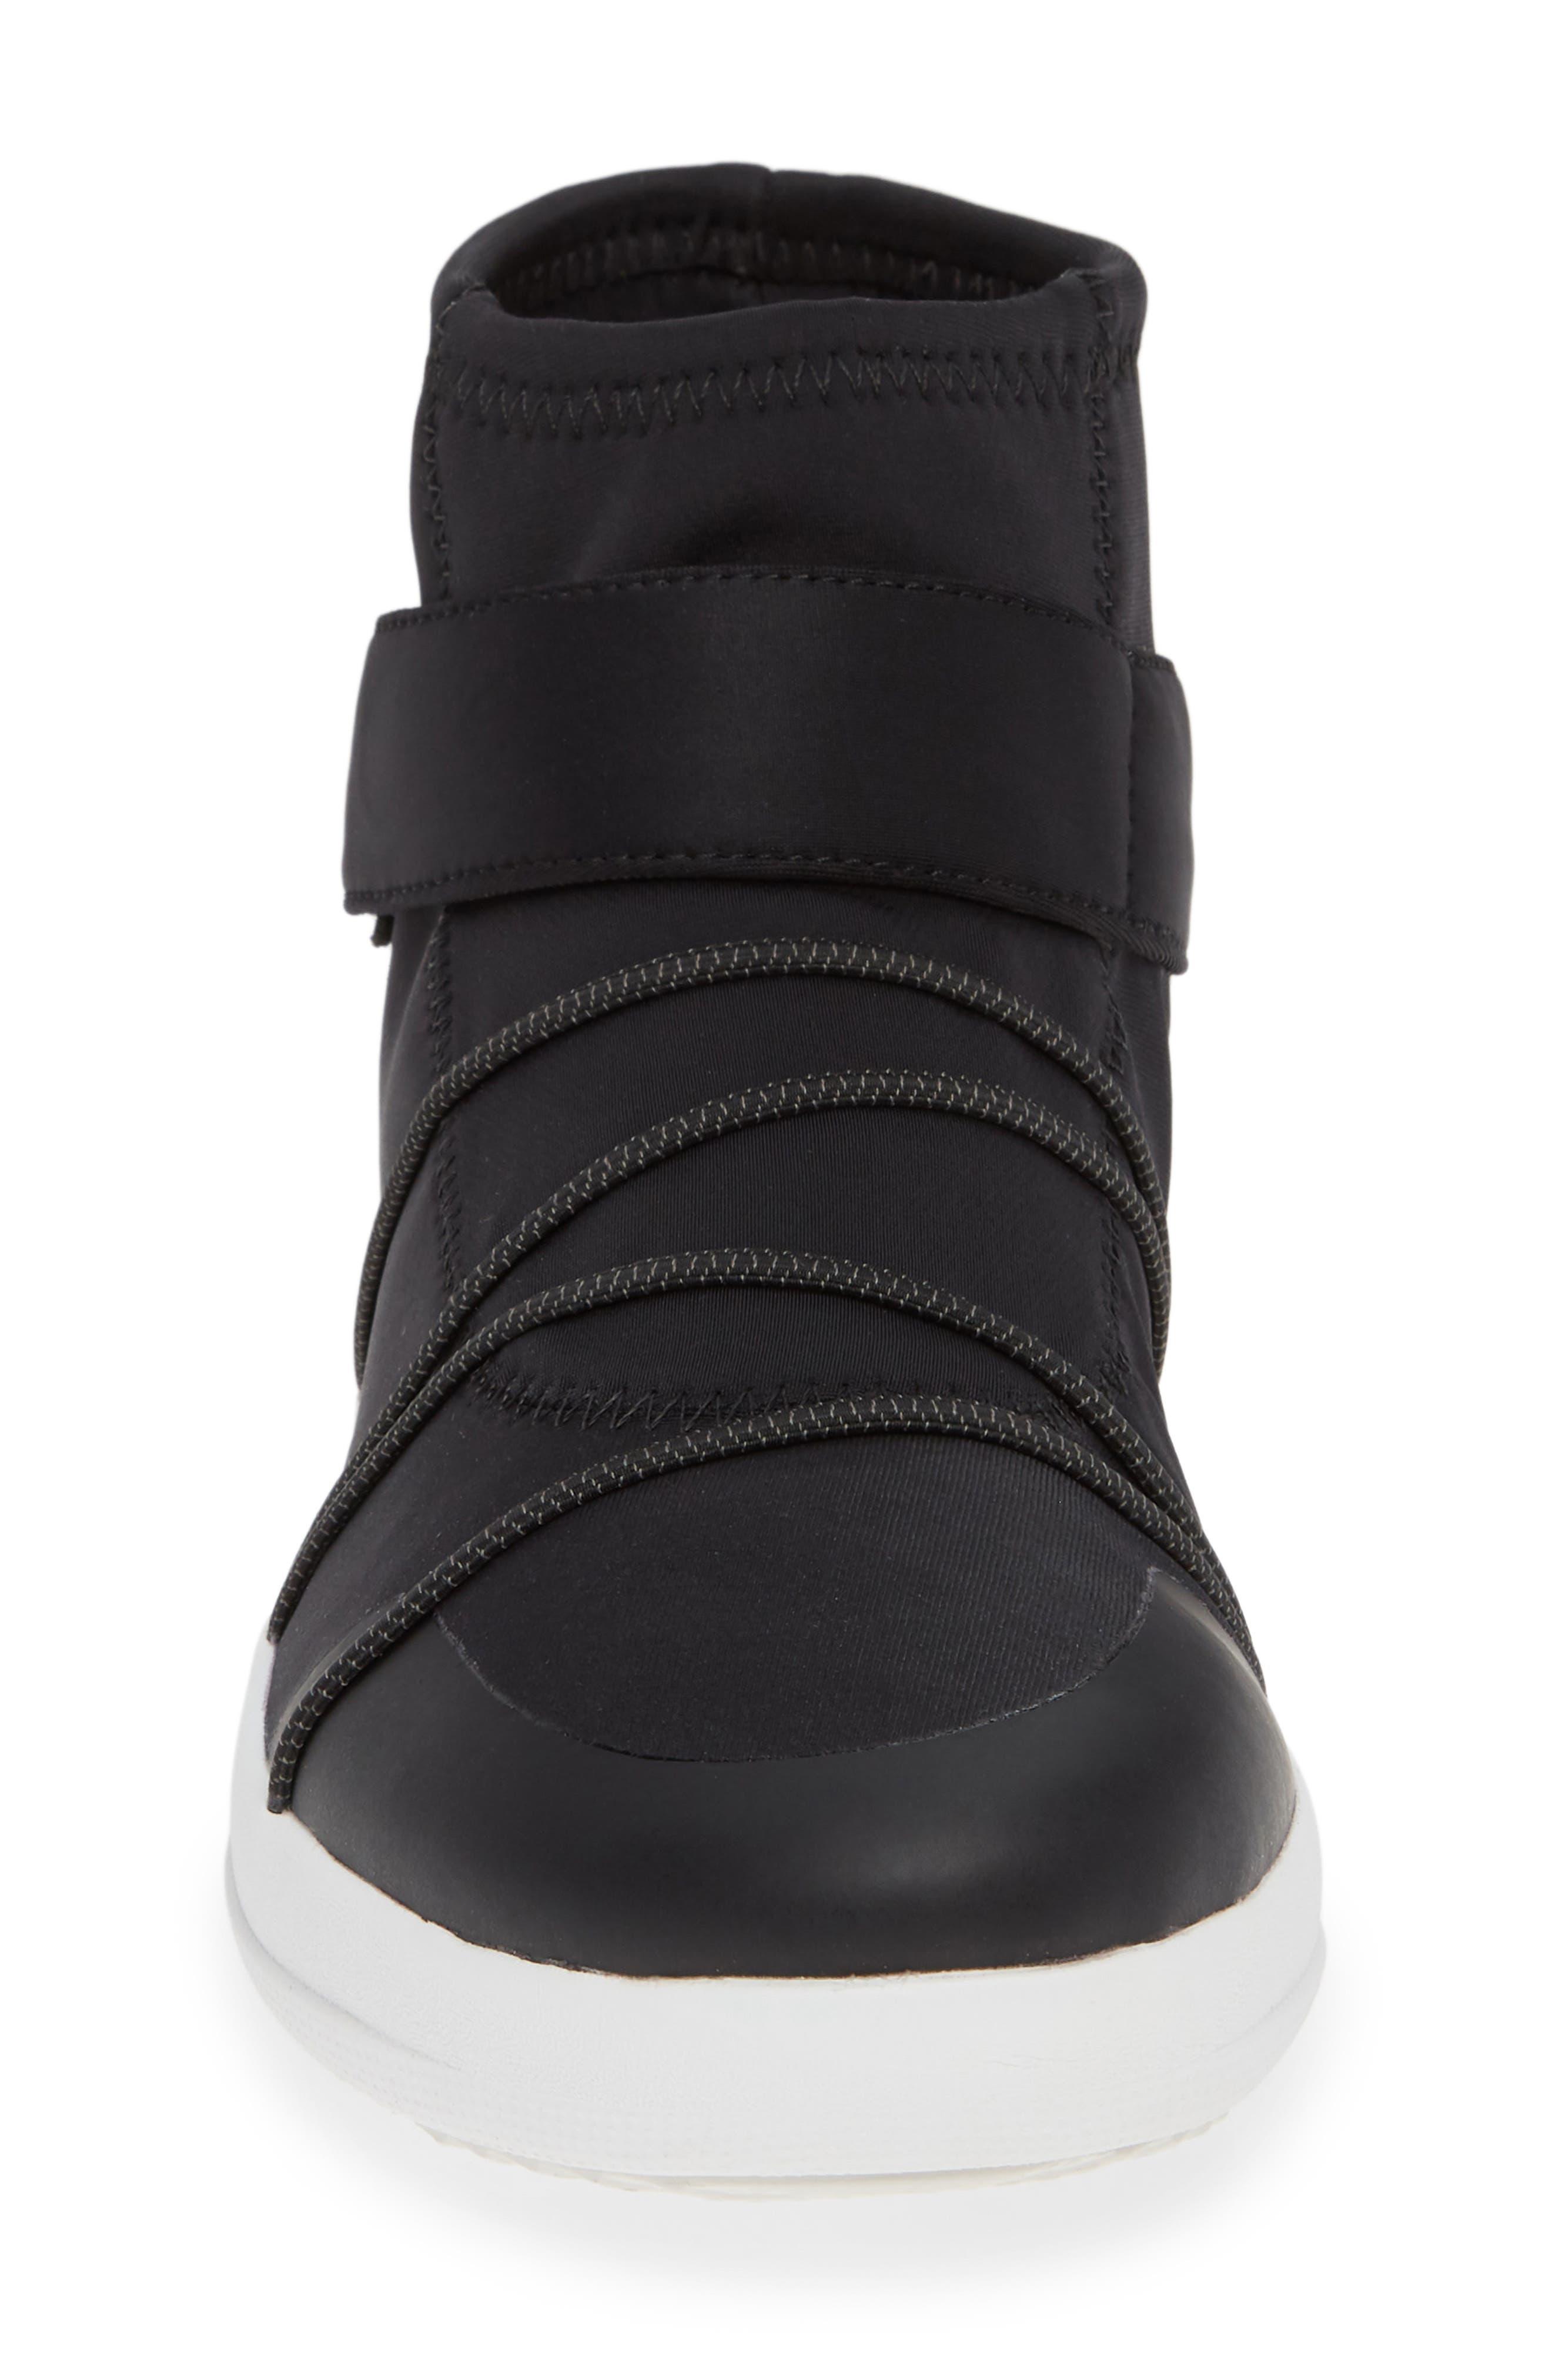 Neoflex High Top Sneaker,                             Alternate thumbnail 4, color,                             BLACK FABRIC